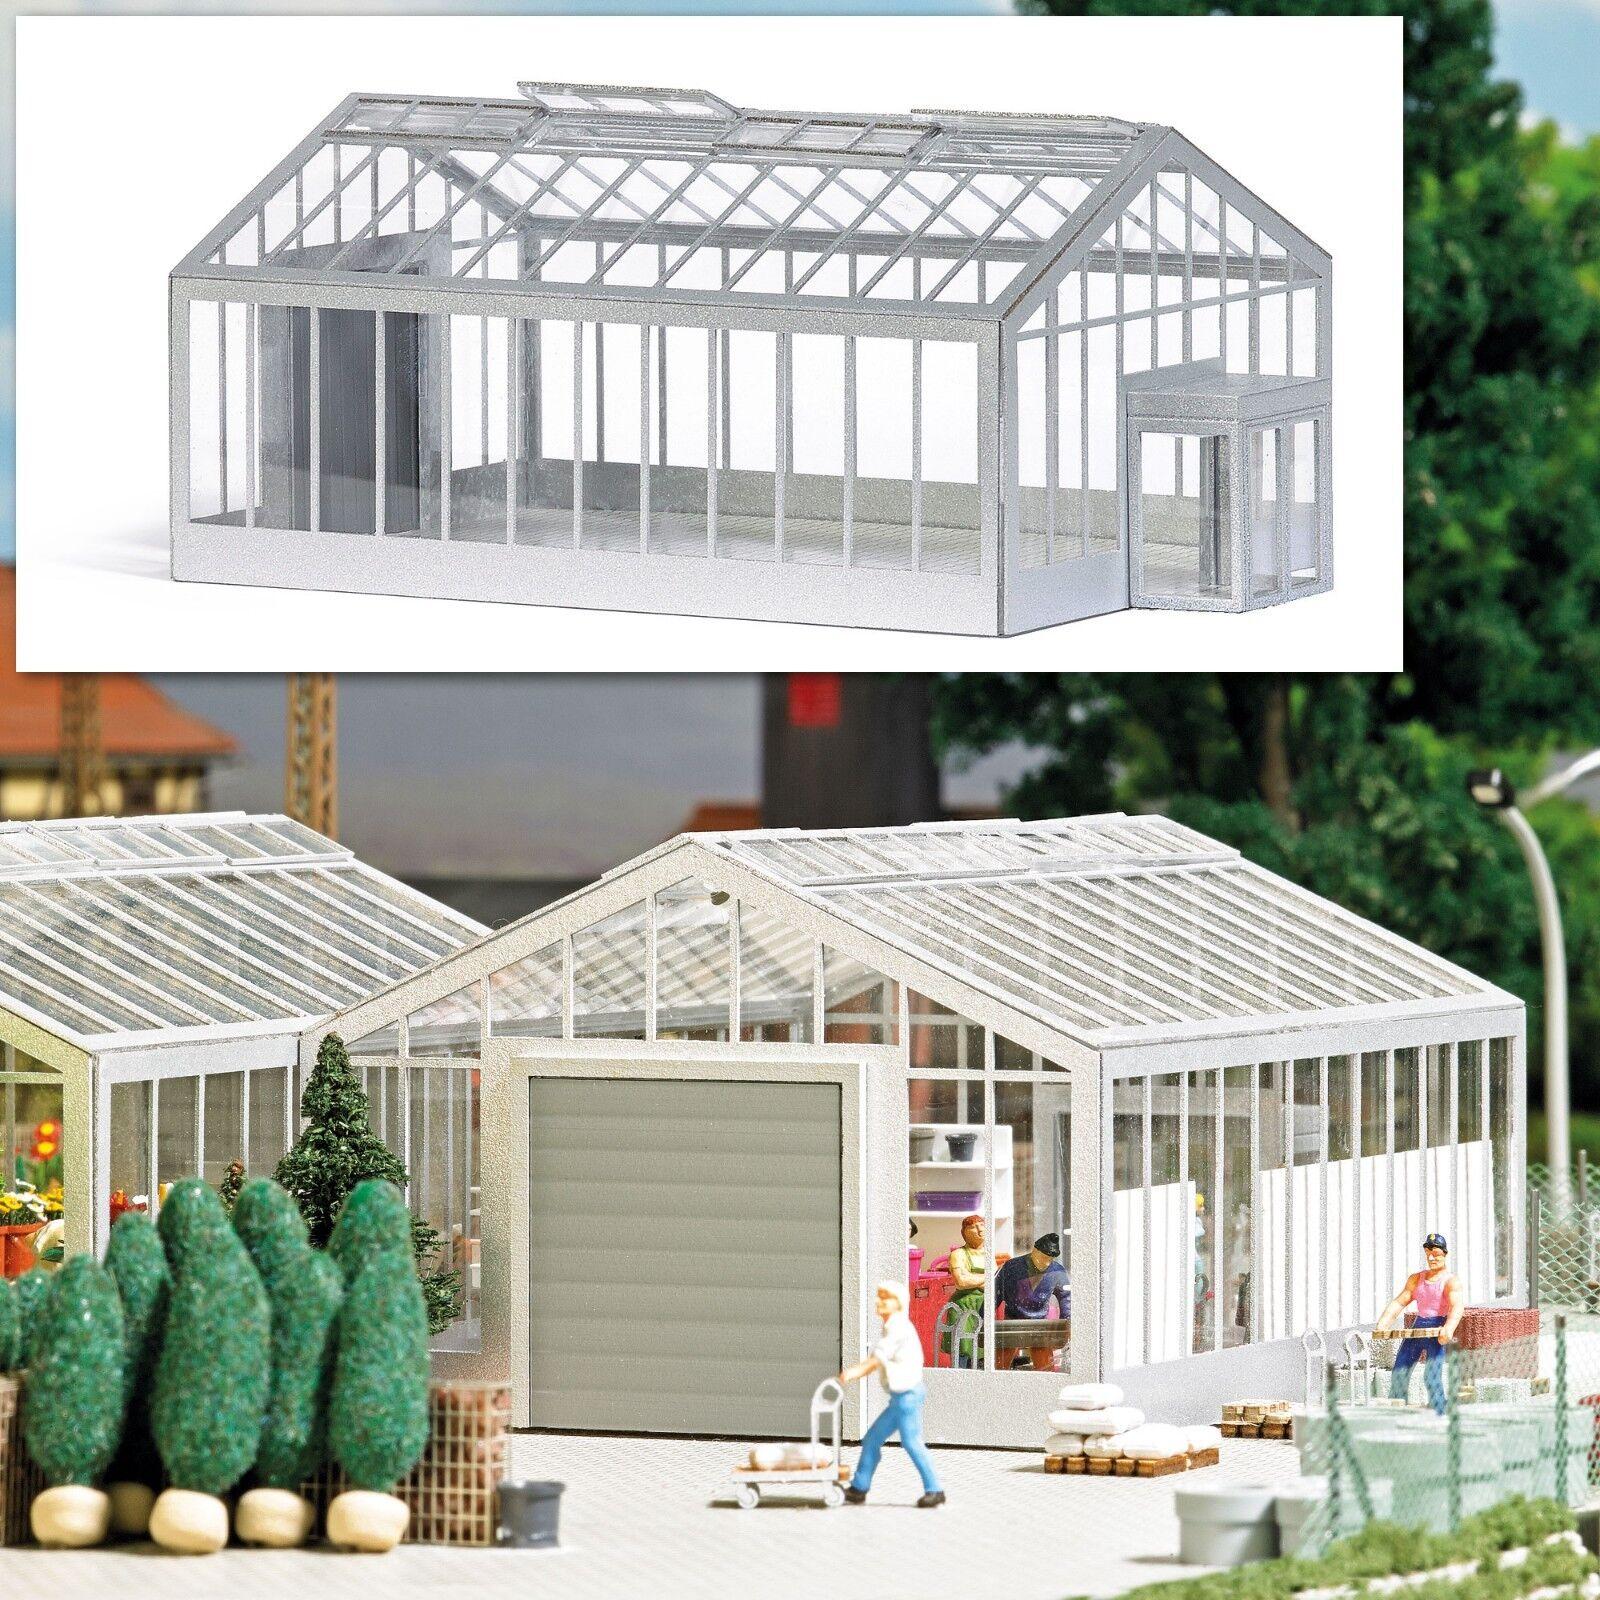 NEW RELEASE   HO 1 87 scale  Busch Garden Center Greenhouse KIT